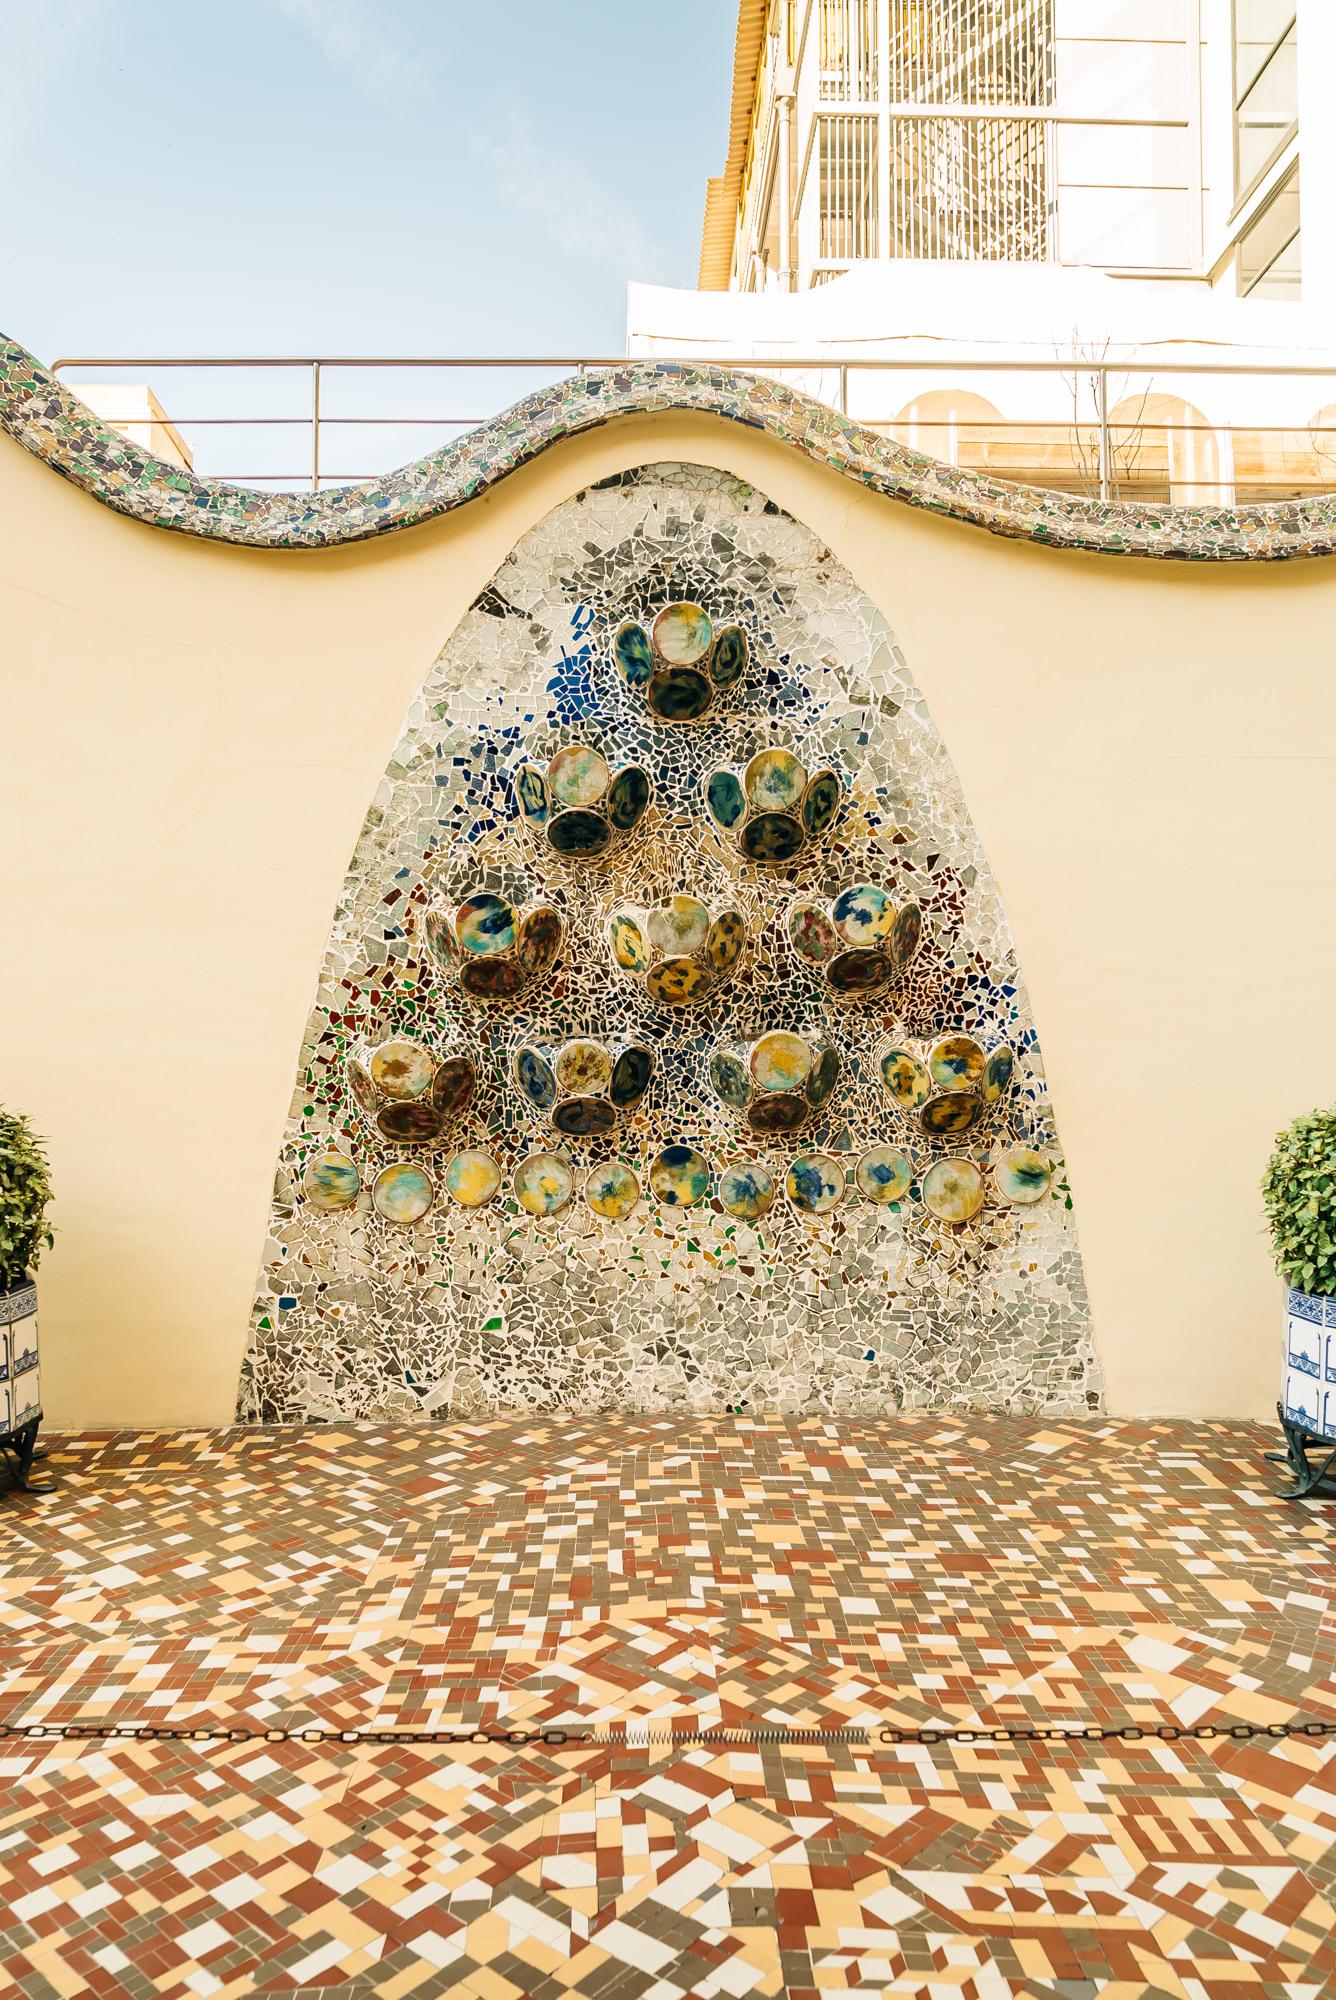 Casa Batlló courtyard